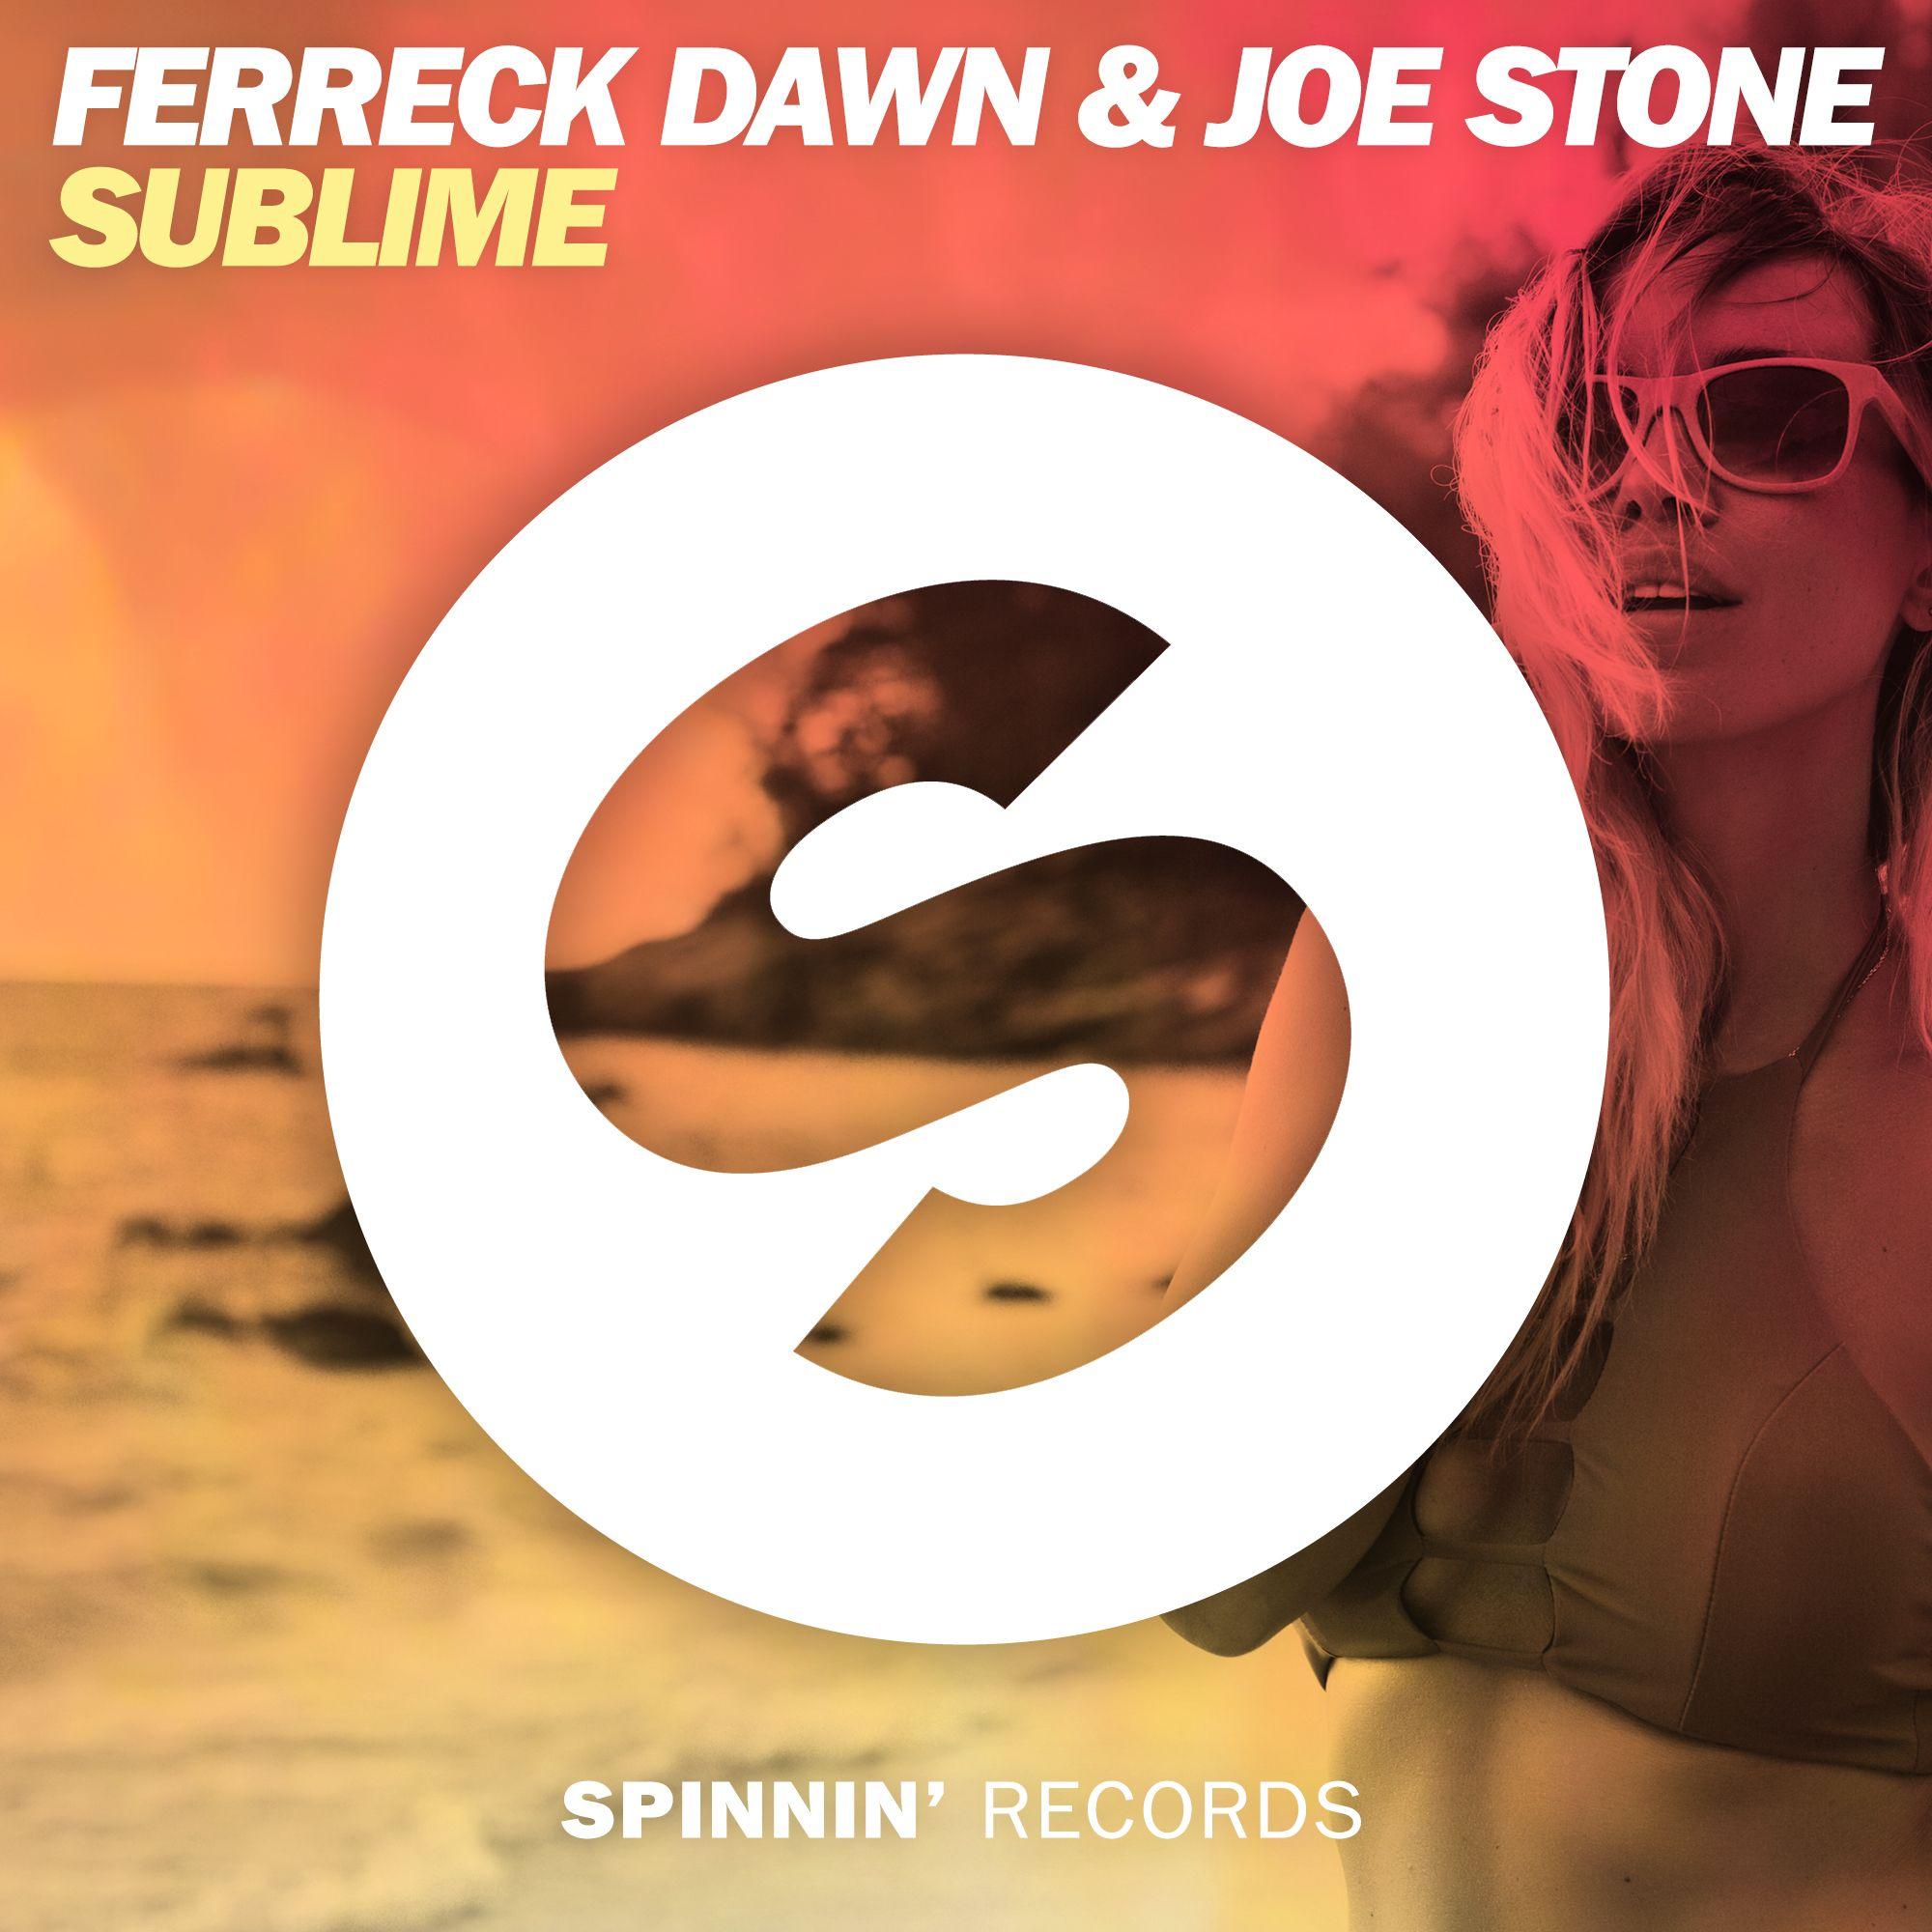 spinnin_ferreck_dawn_joe_stone_-_sublime.jpg